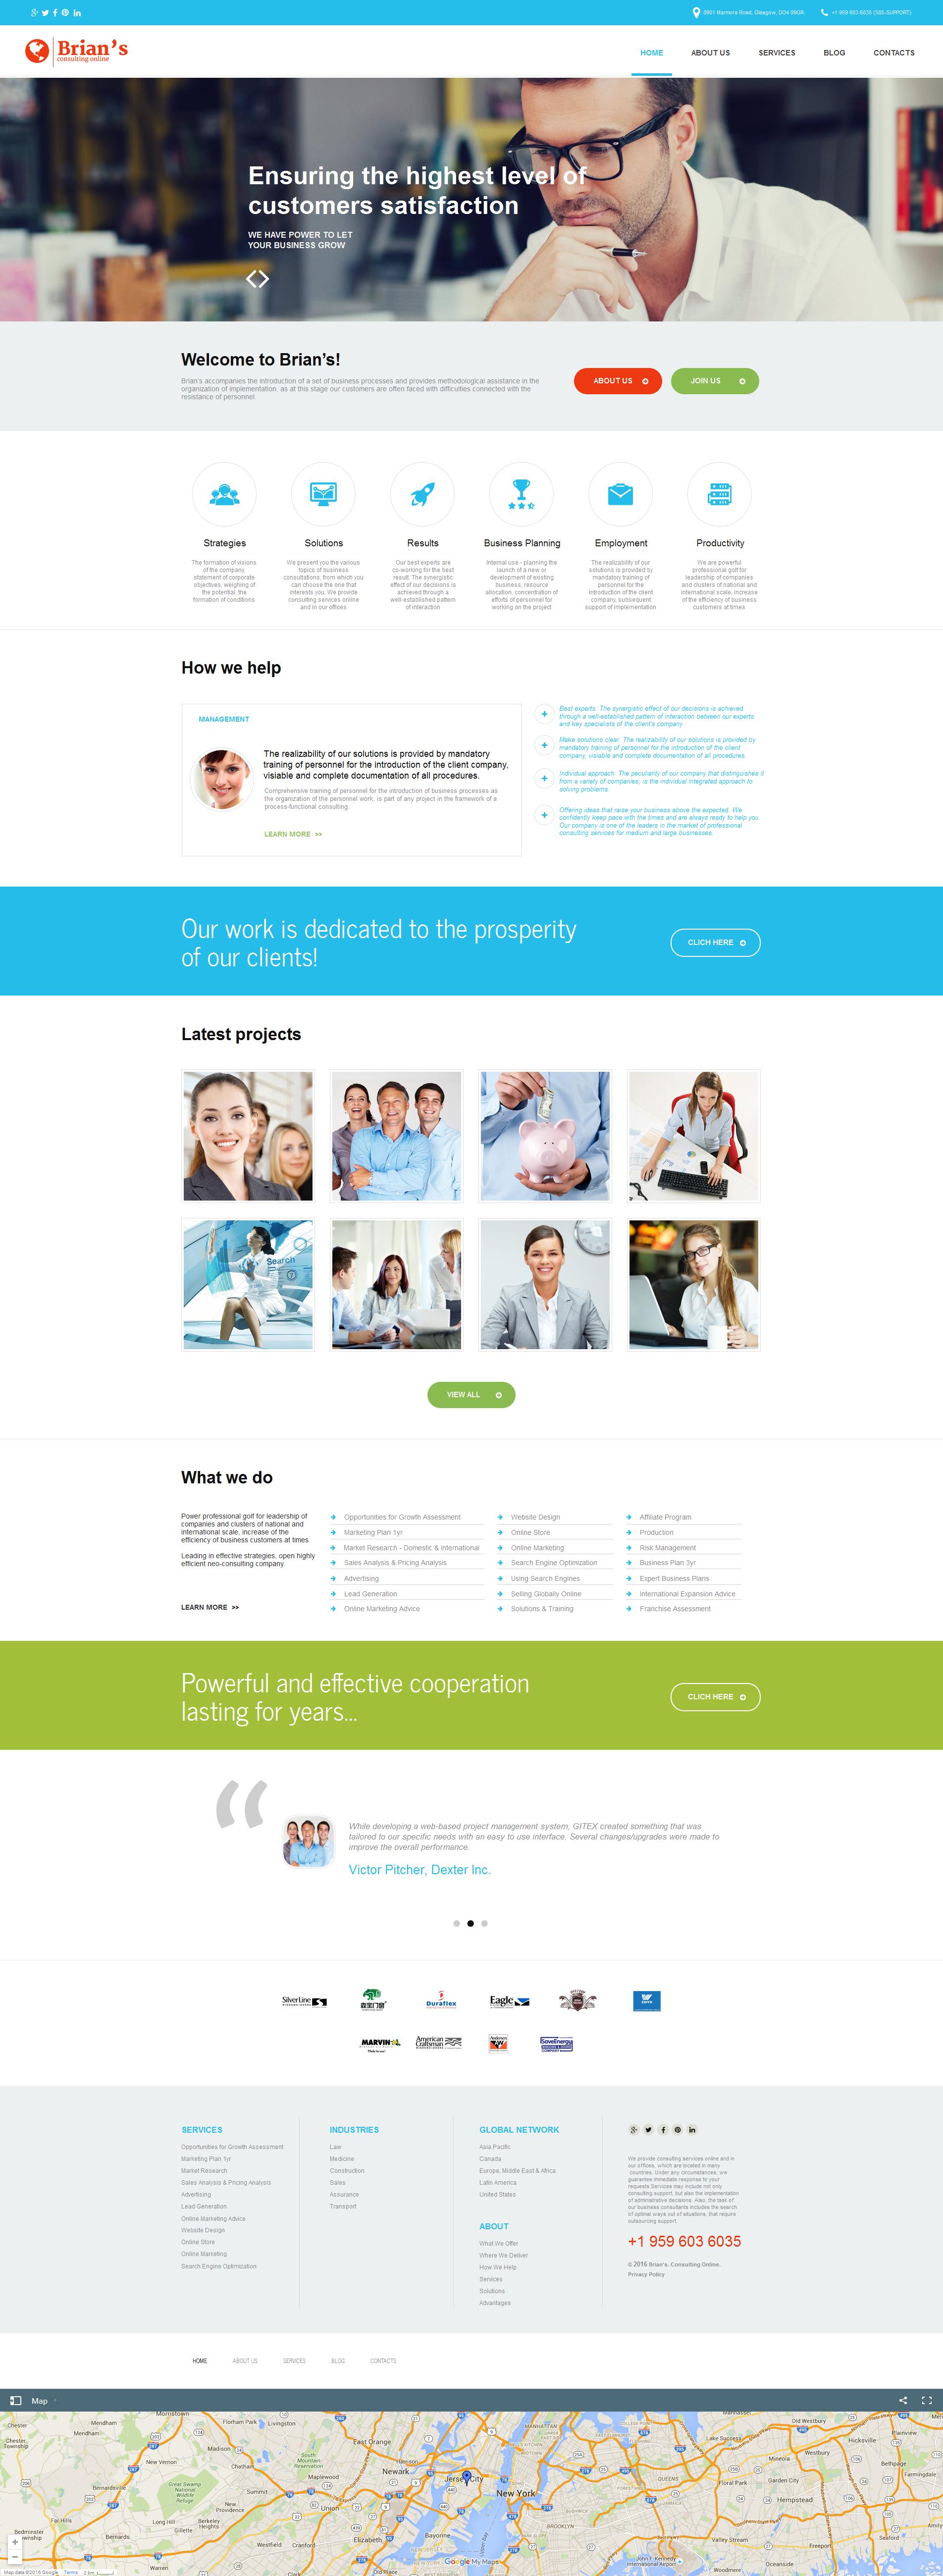 Plantilla Moto CMS HTML #56089 para Sitio de Consultoría